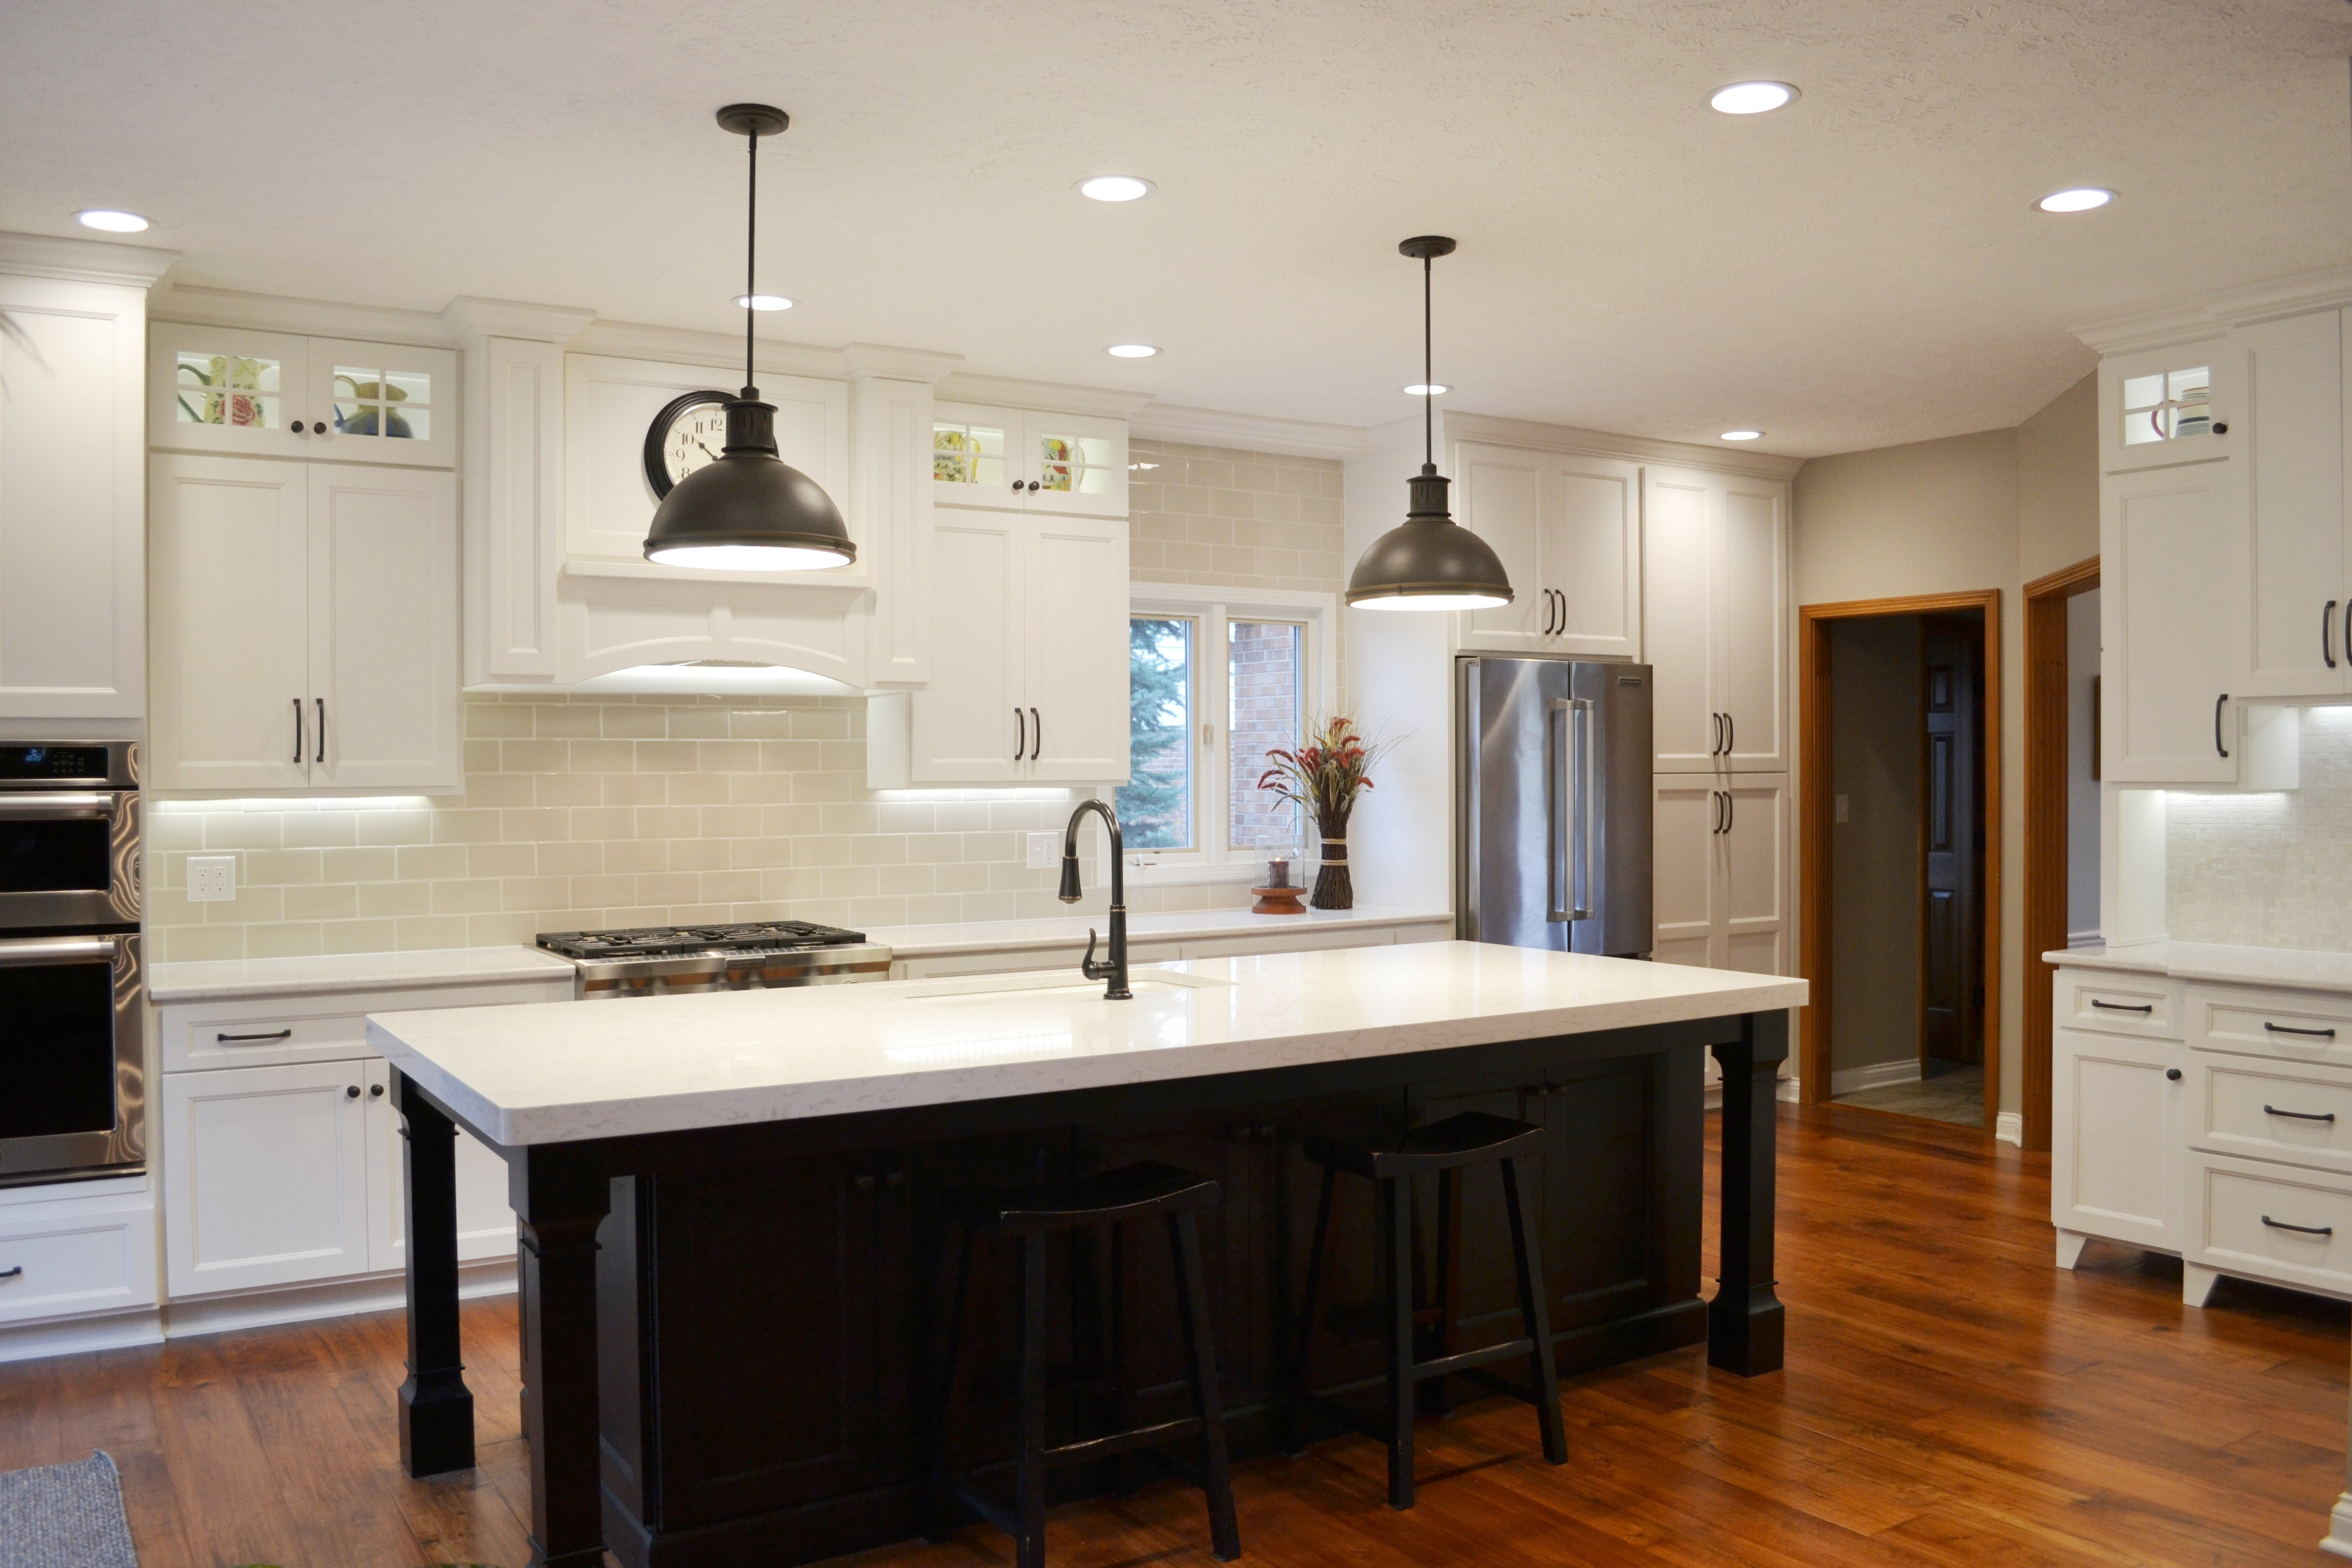 Kitchens | Pendant Lighting Brings Style and Illumination - ACo